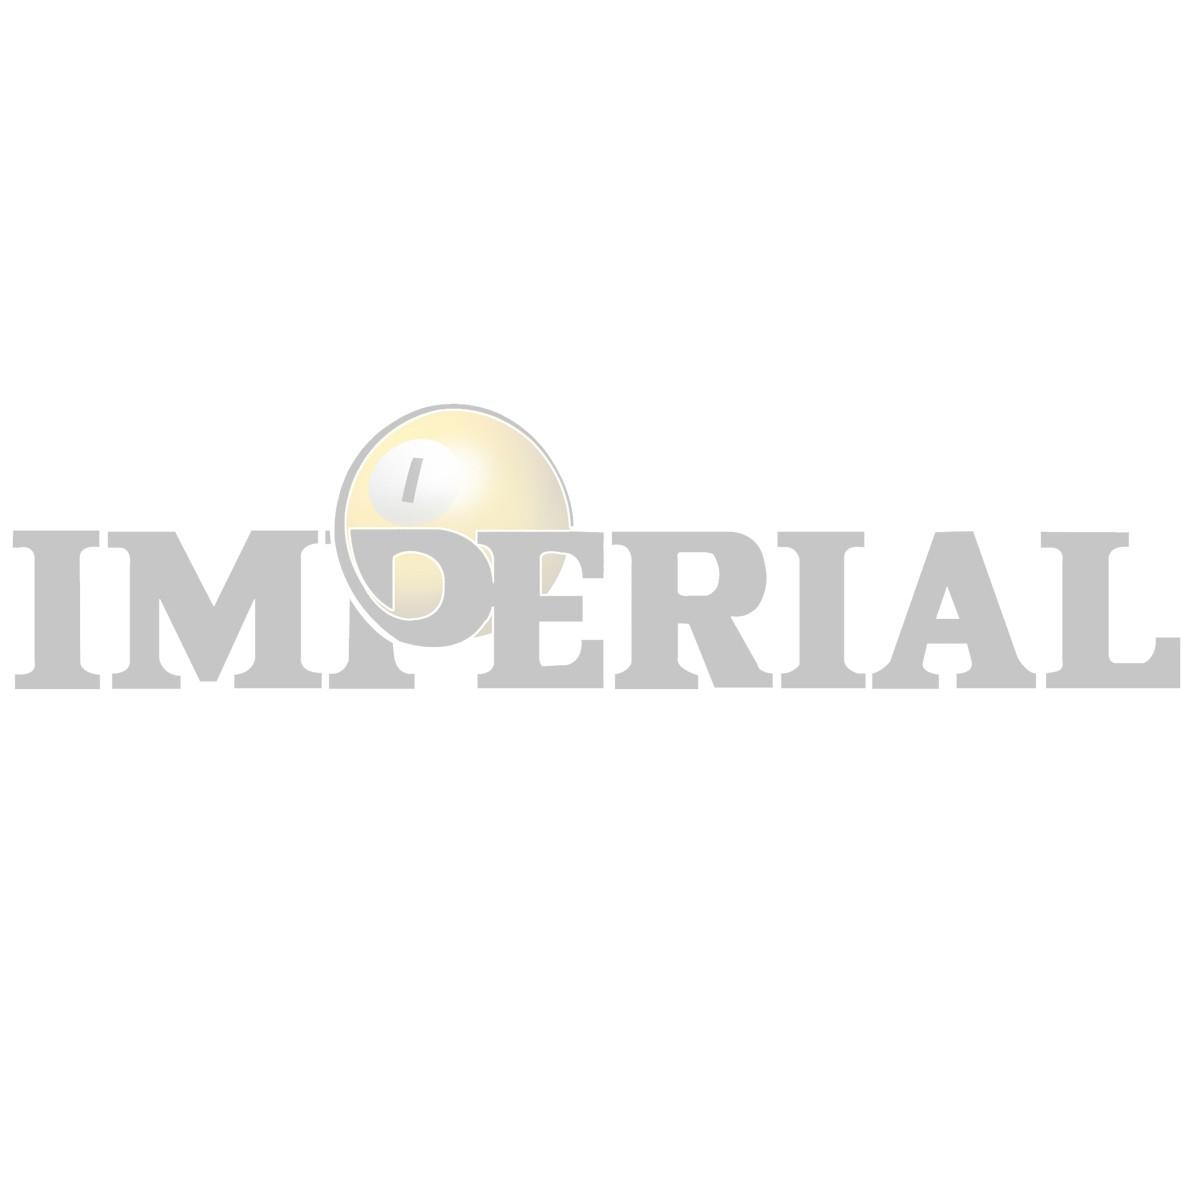 Pittsburgh Pirates Home vs. Away Billiard Ball Set